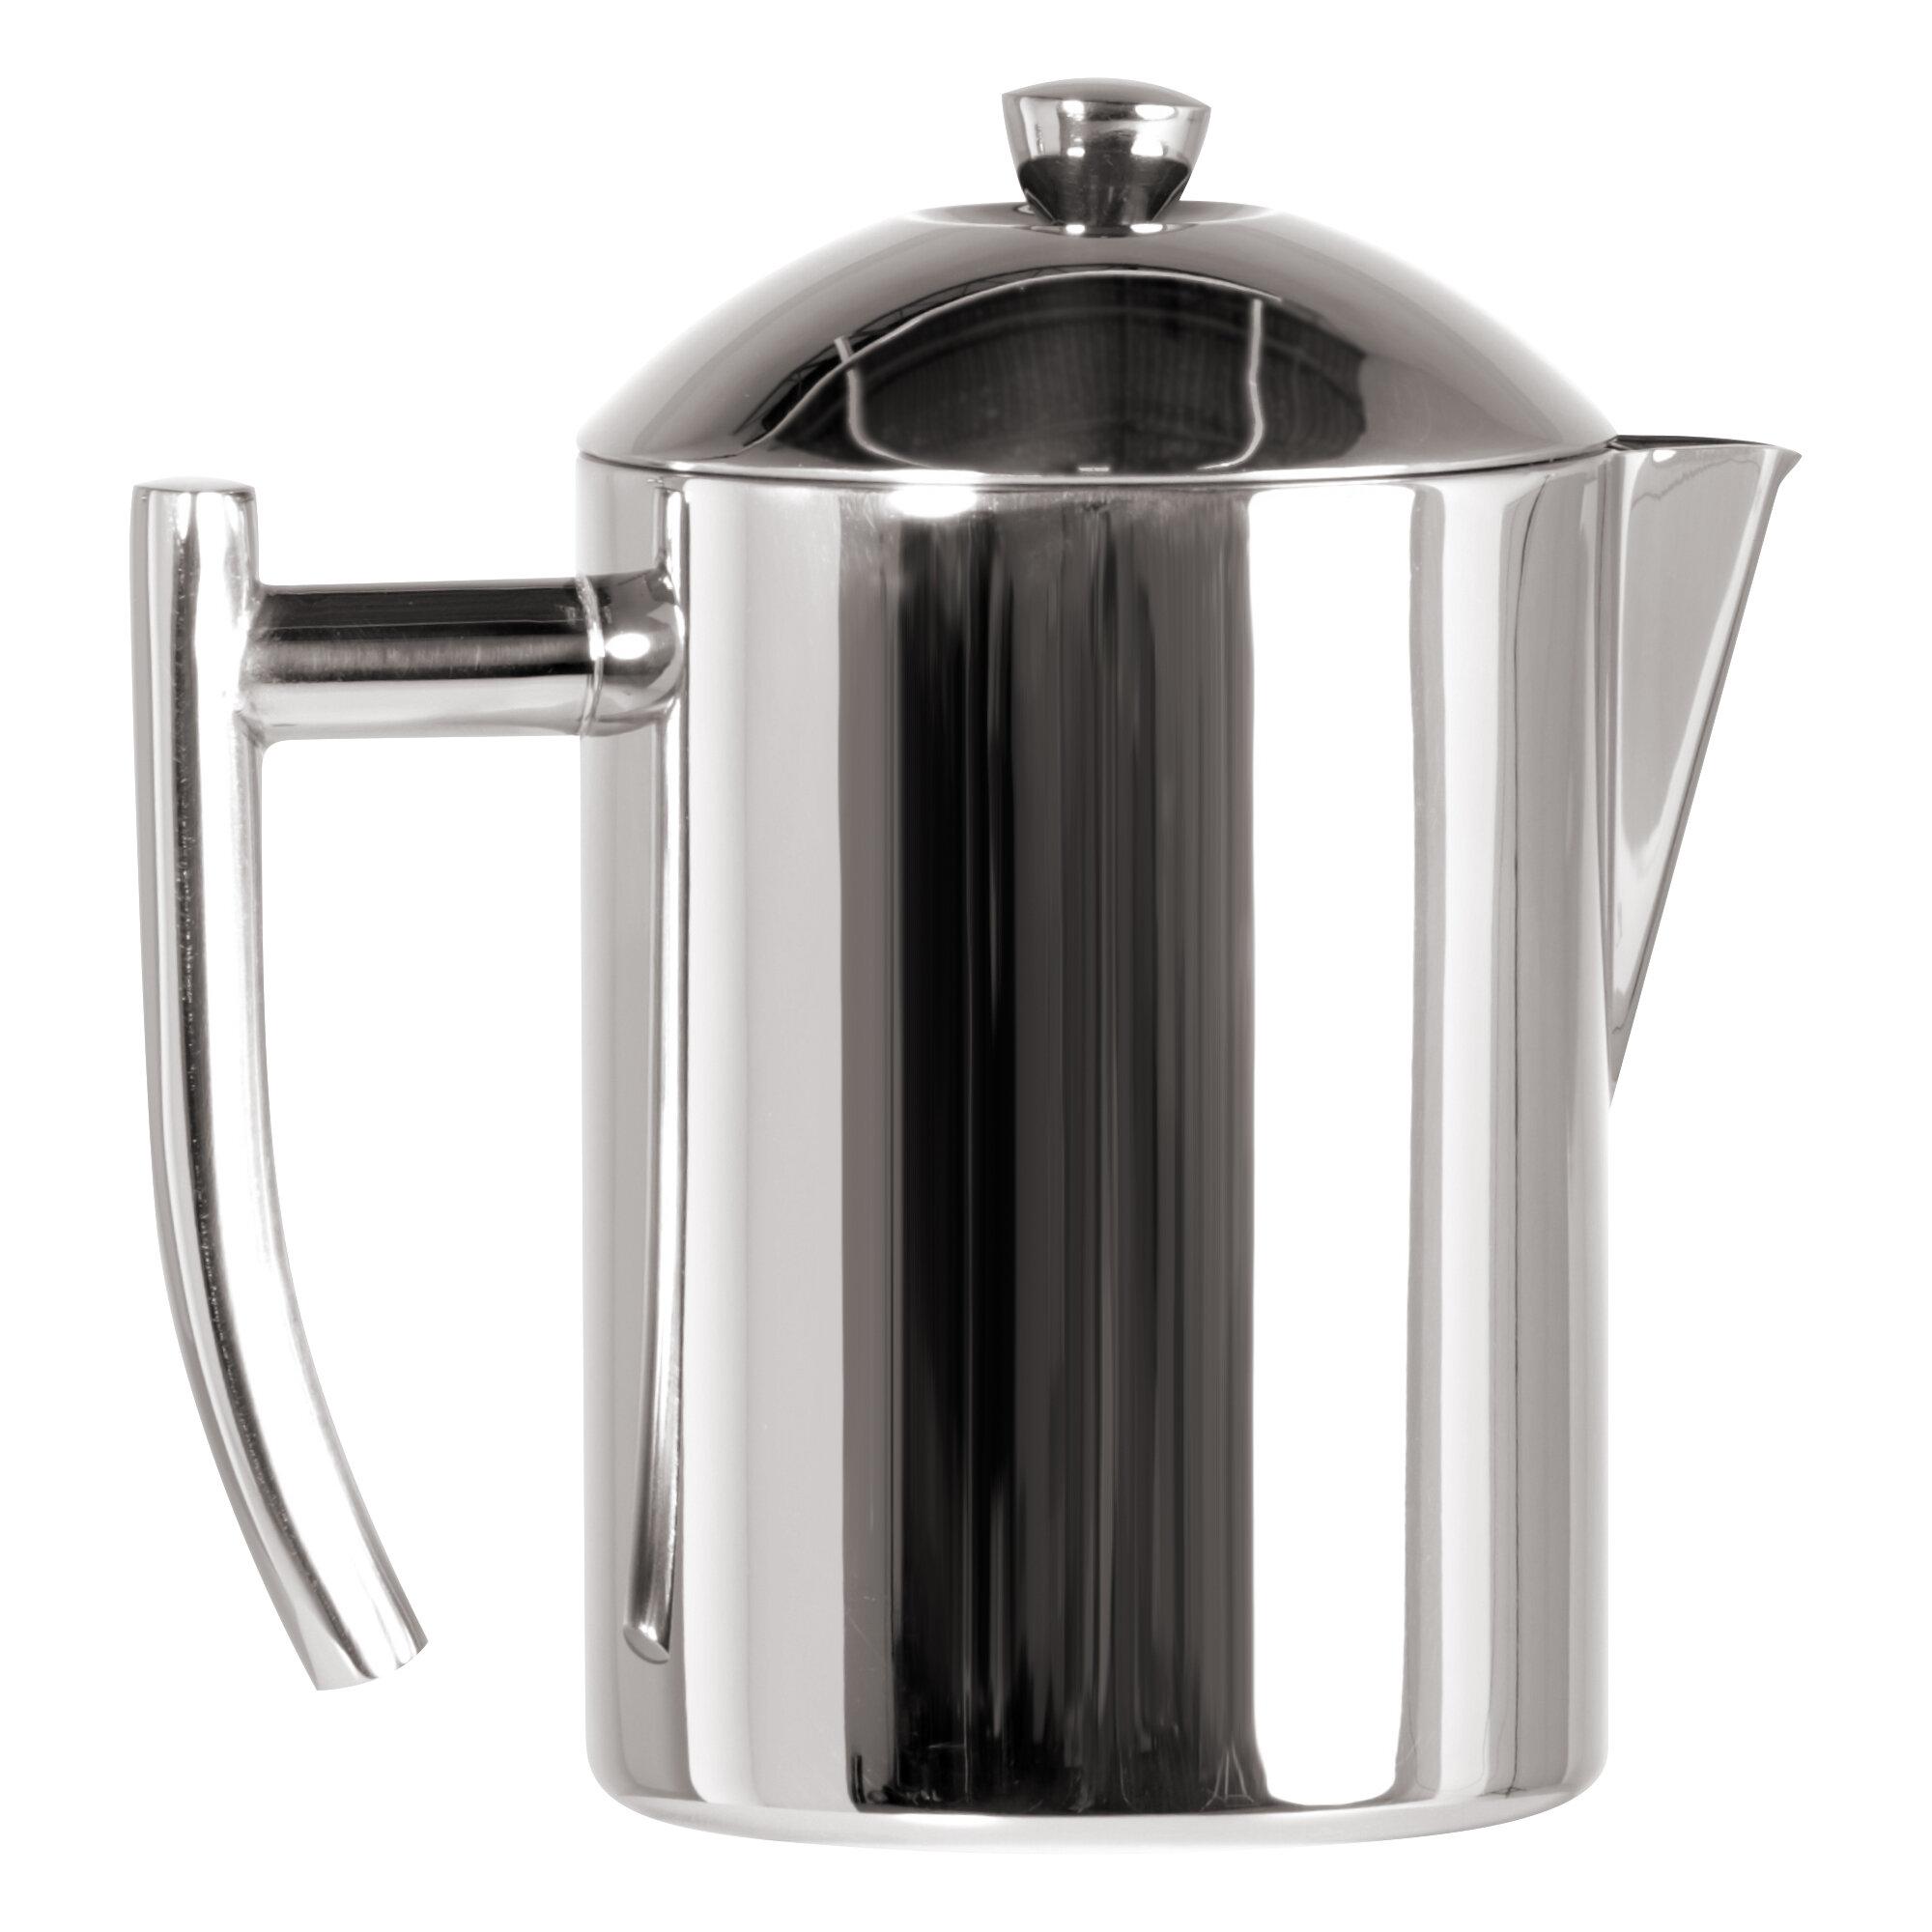 Steeper Infuser Frieling Stainless Steel Tea Stick